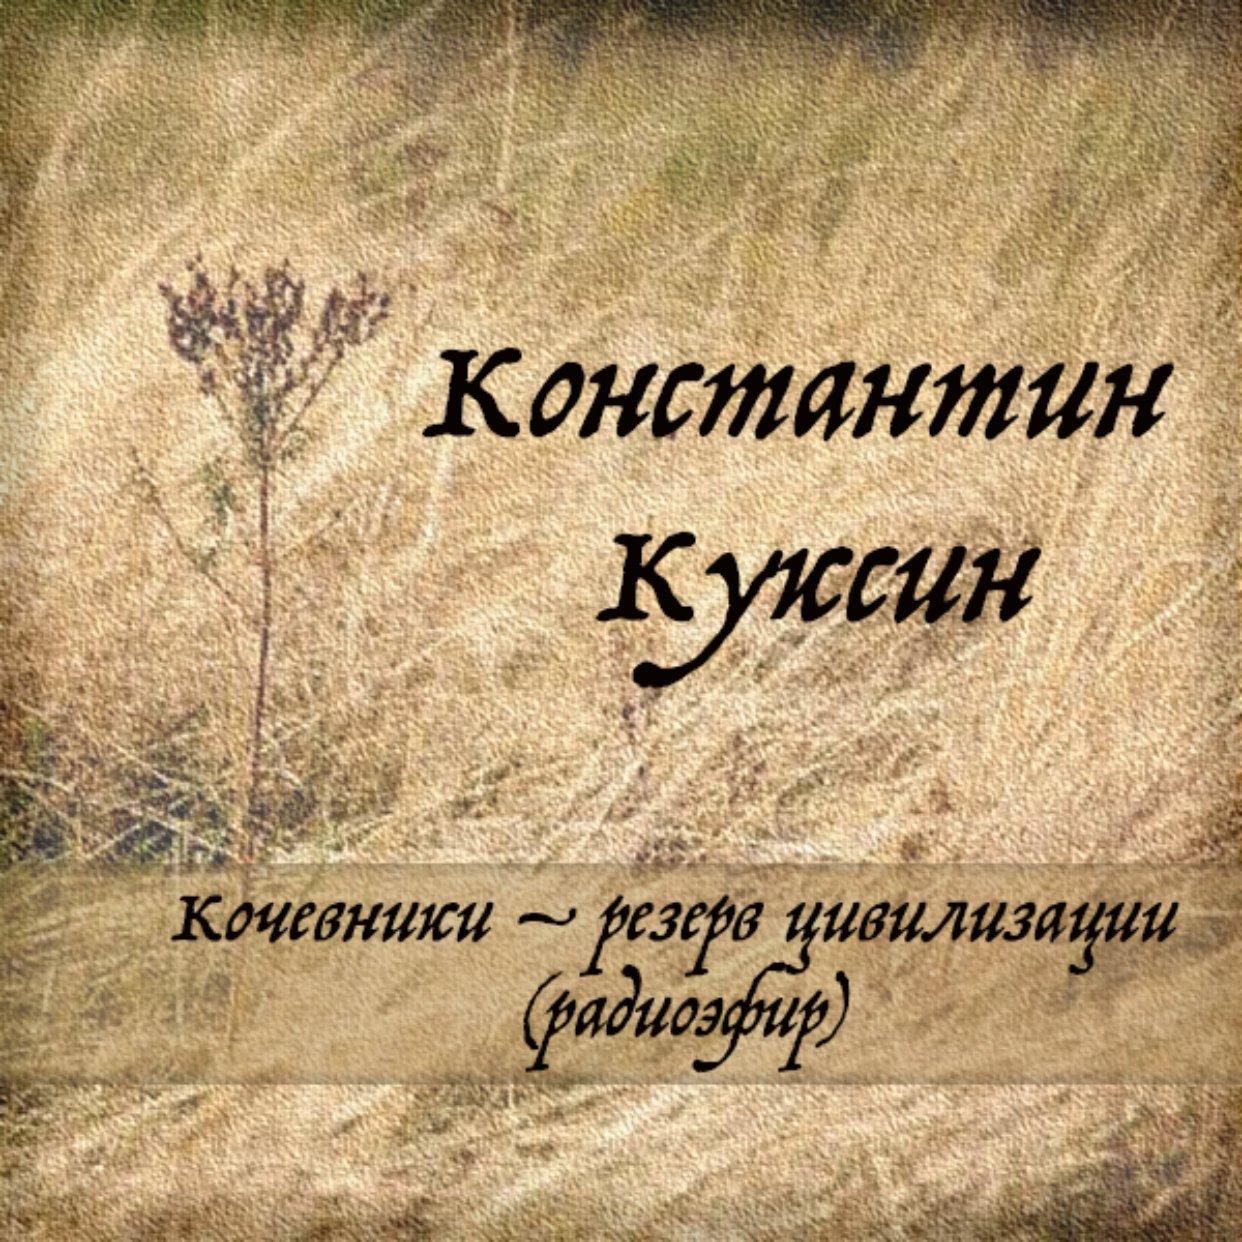 Кочевники – резерв цивилизации (радиоэфир)